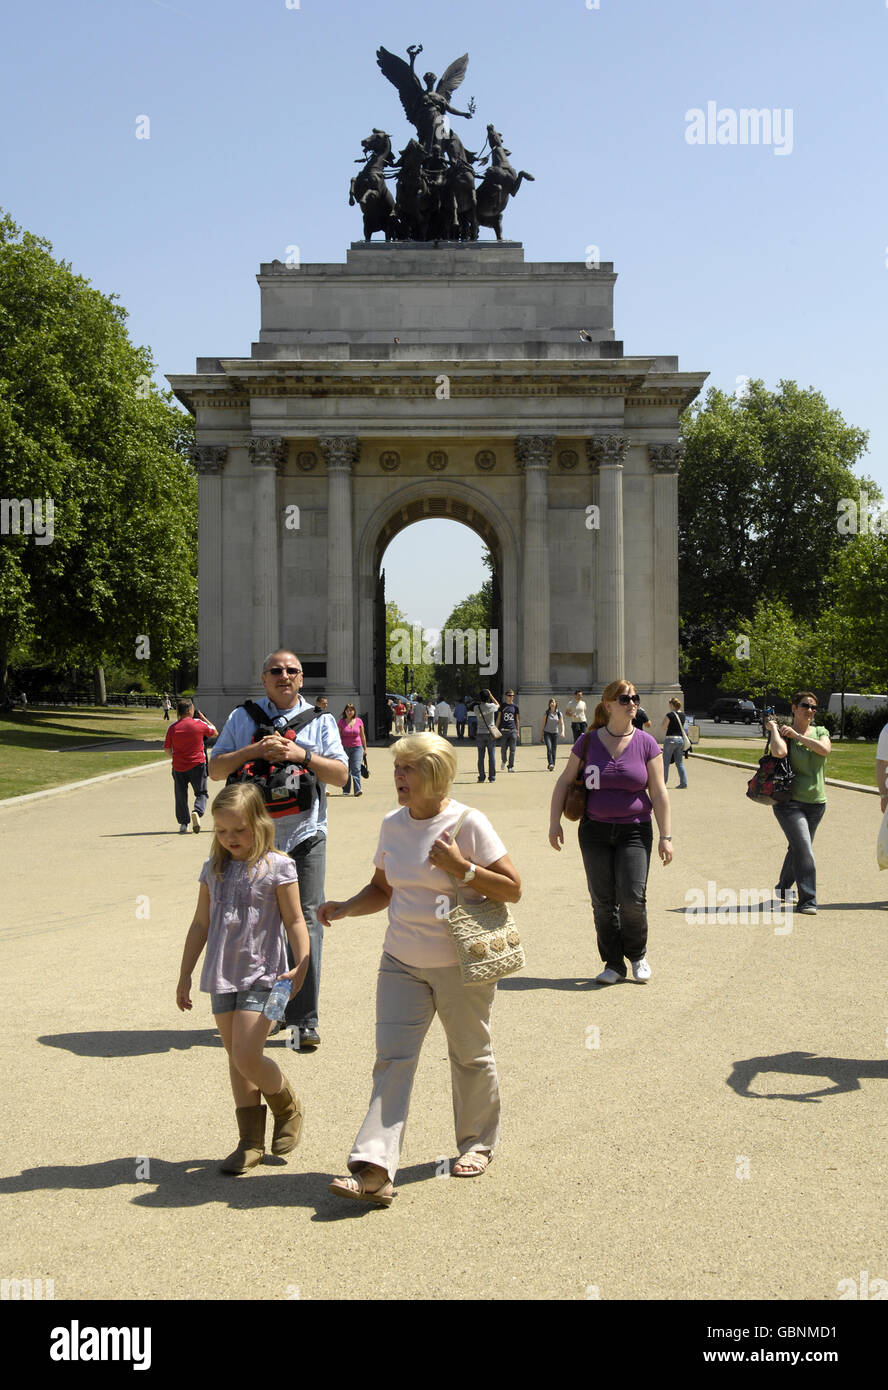 Weather - Summer - Heat Wave - London - Stock Image